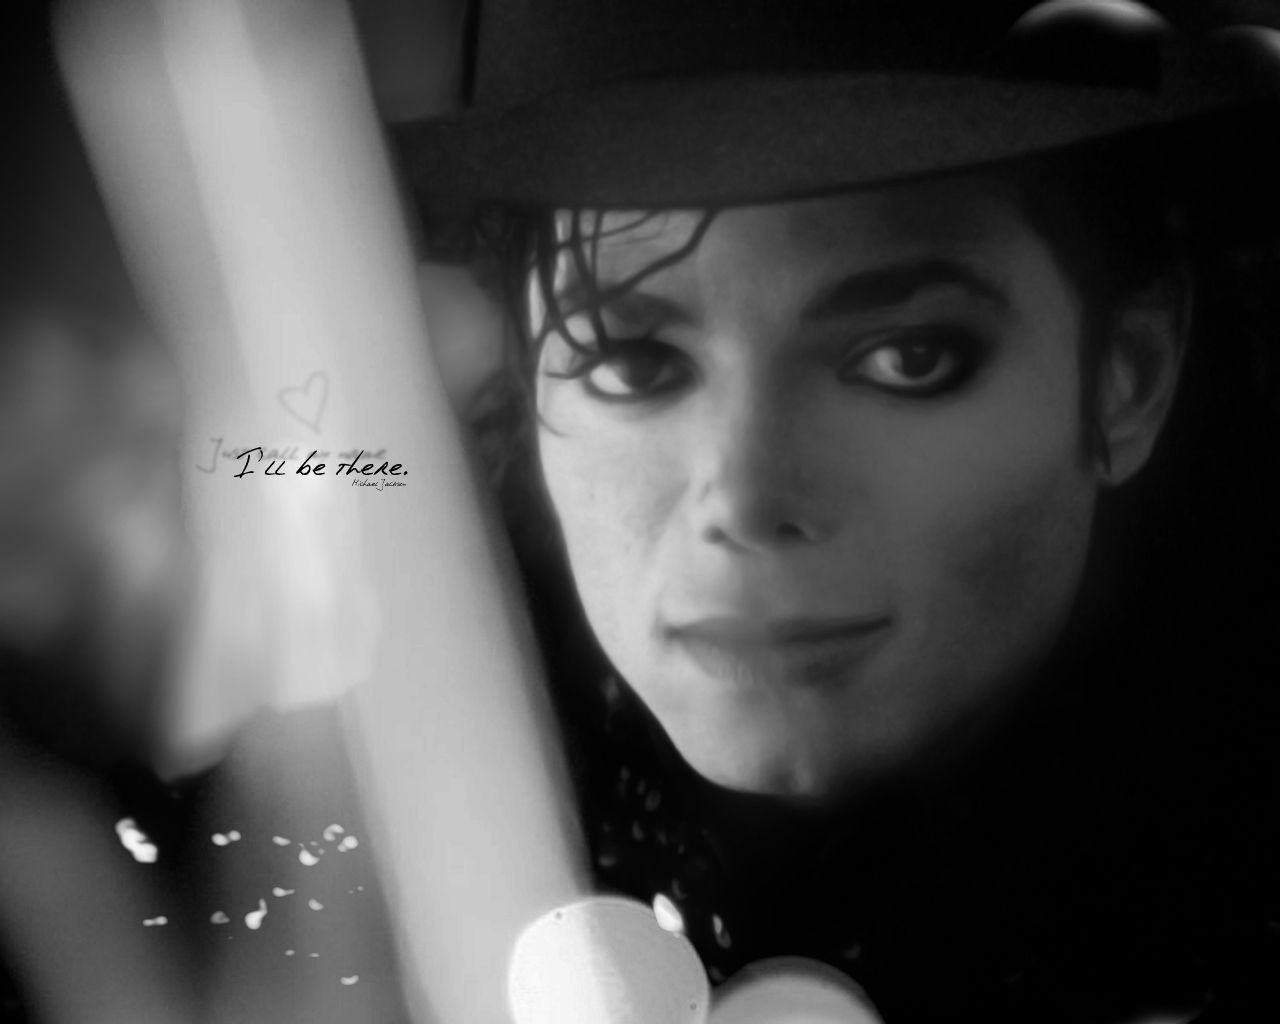 Michael Jackson Wallpaper For Bedroom 17 Best Images About Michael Jackson On Pinterest Michael